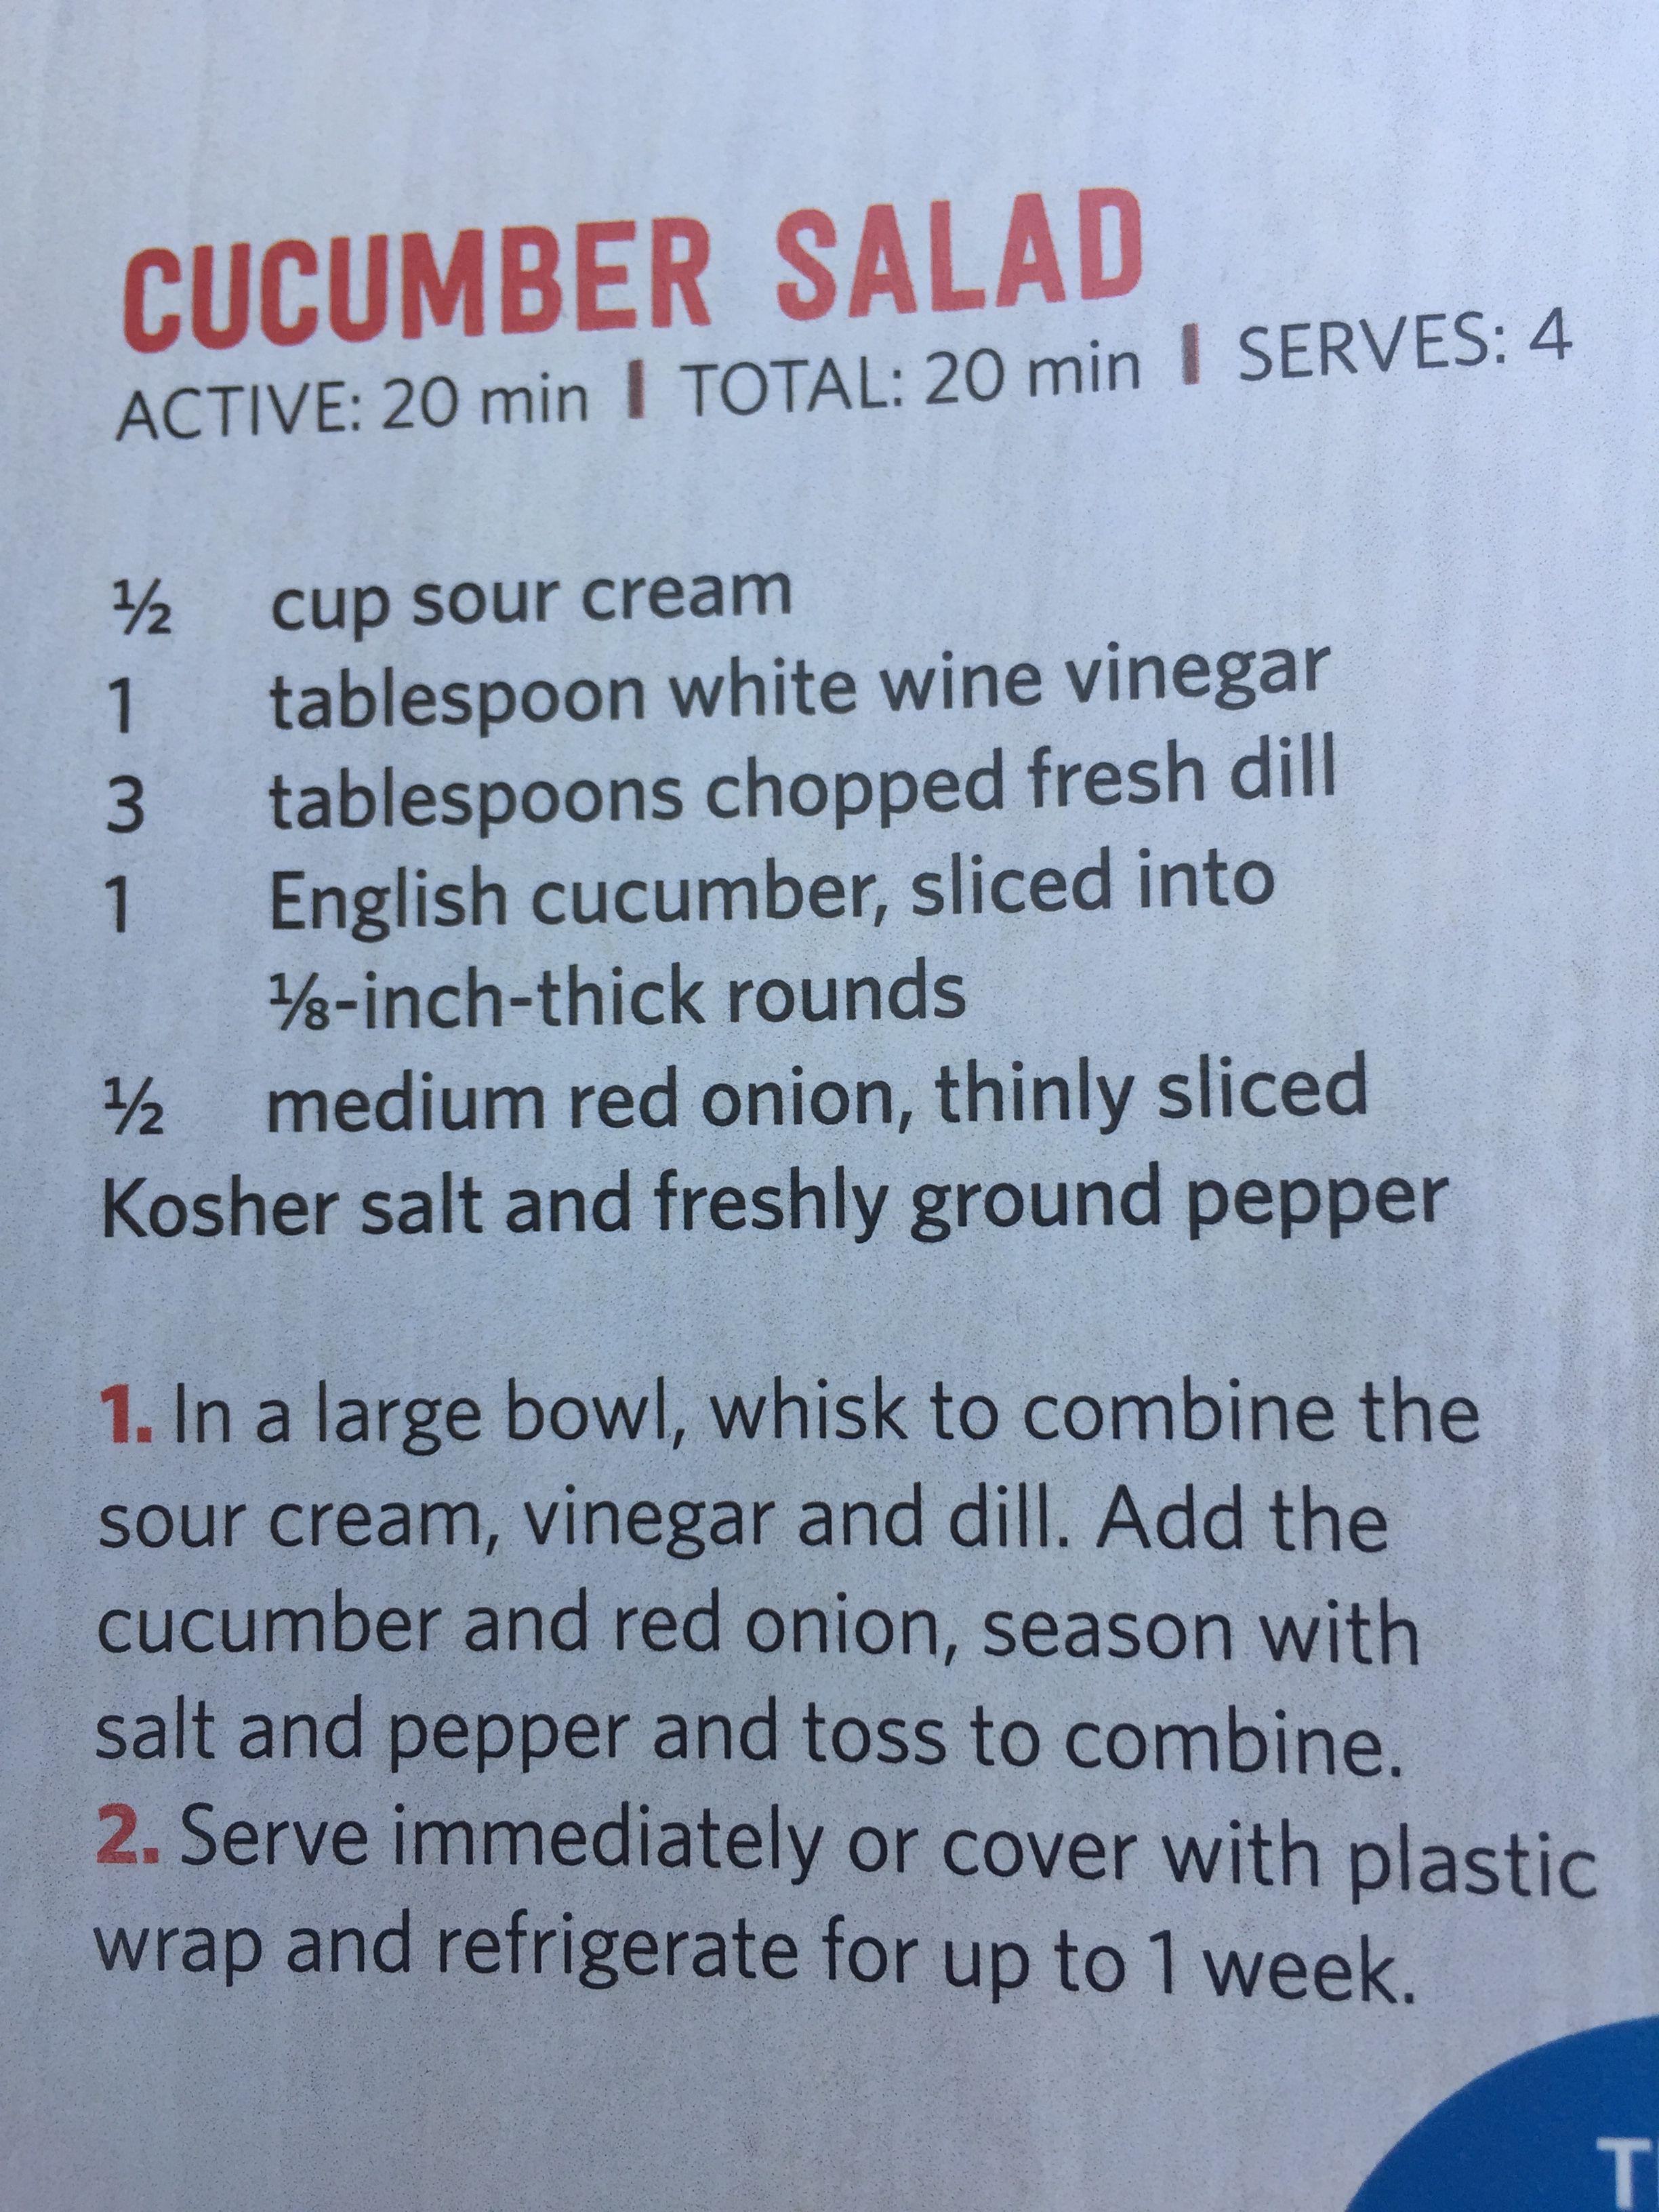 Whole Cauliflower Recipes Buffalo